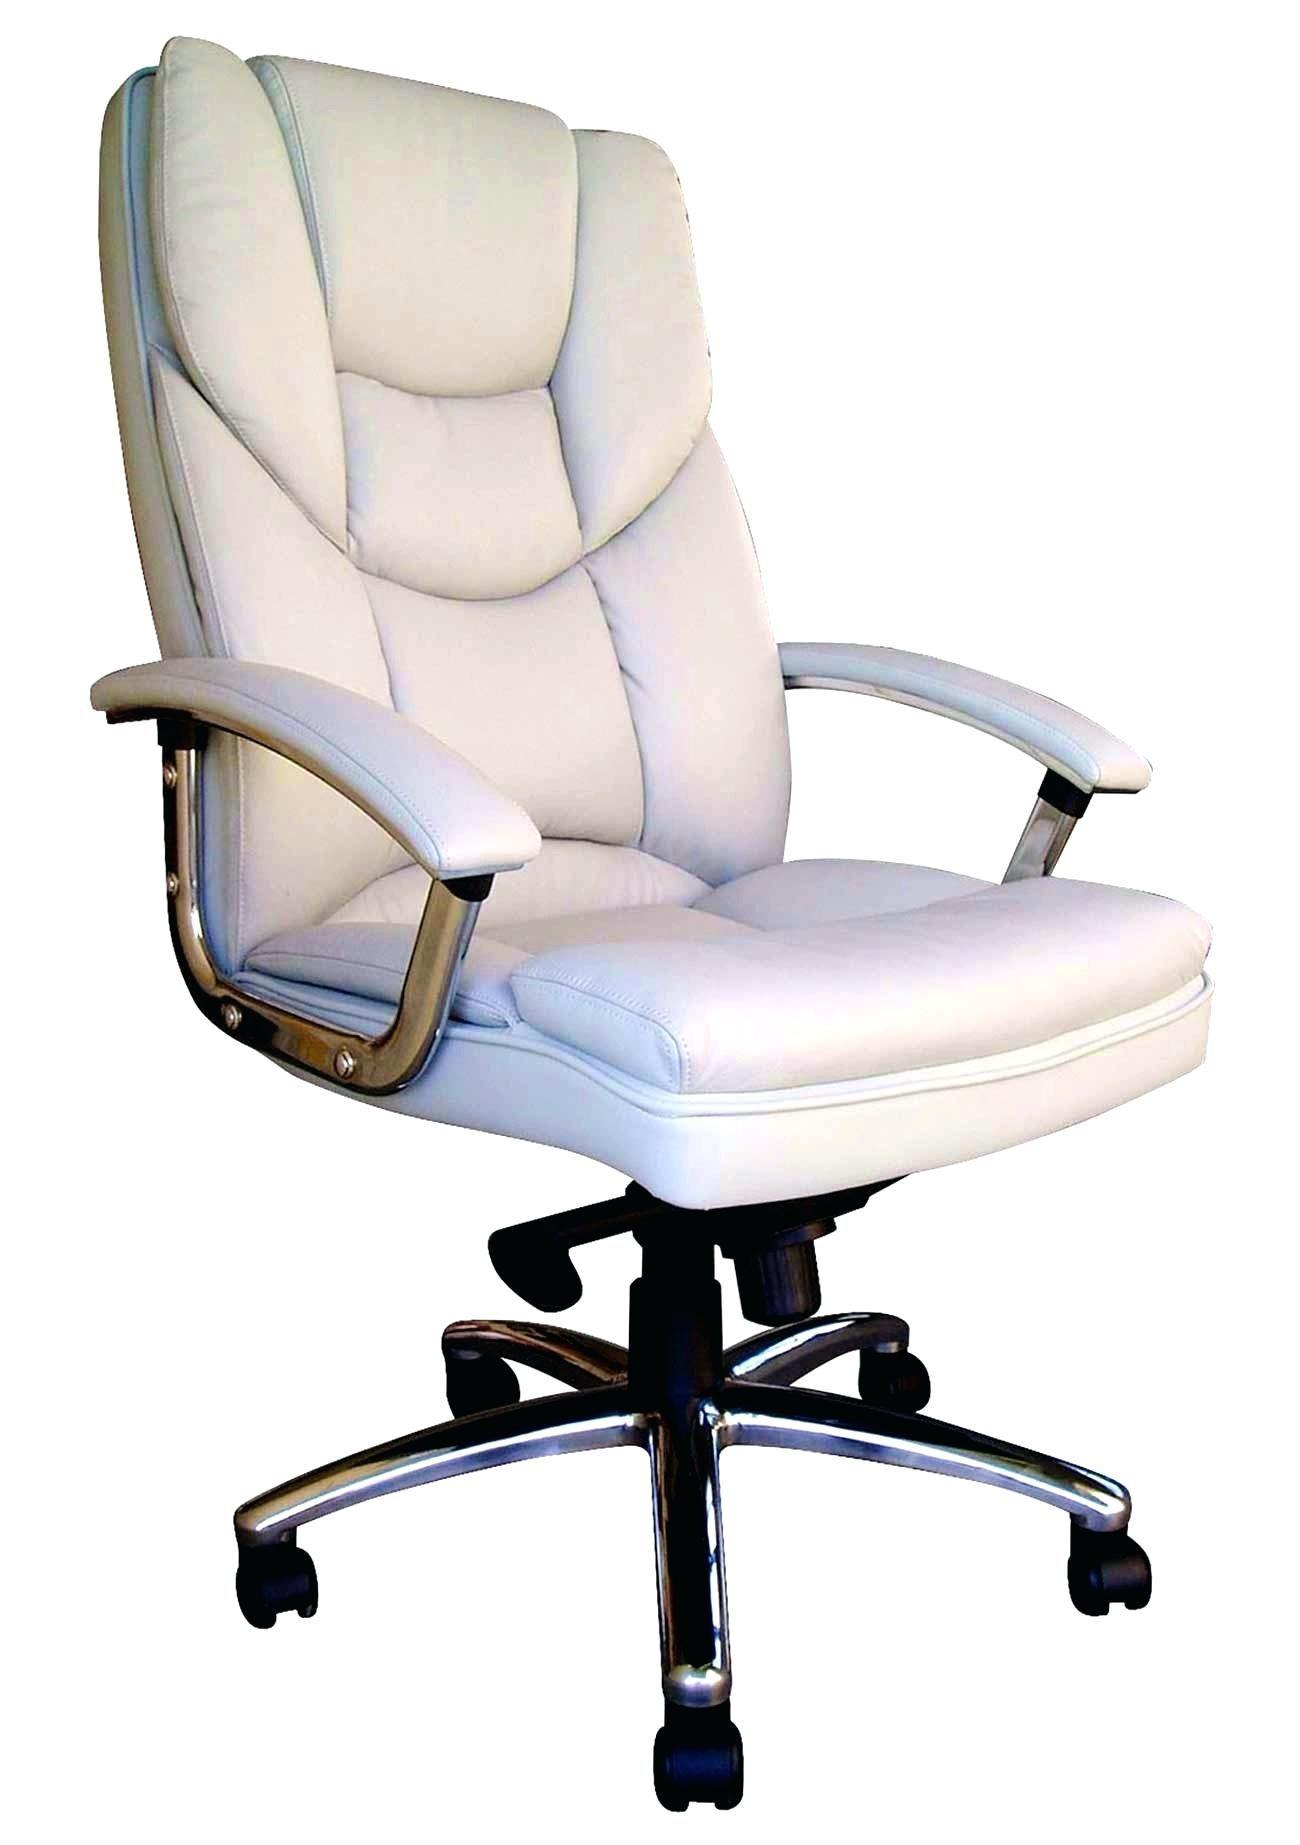 Cheap White Office Chair Weiße stühle, Coole bürostühle